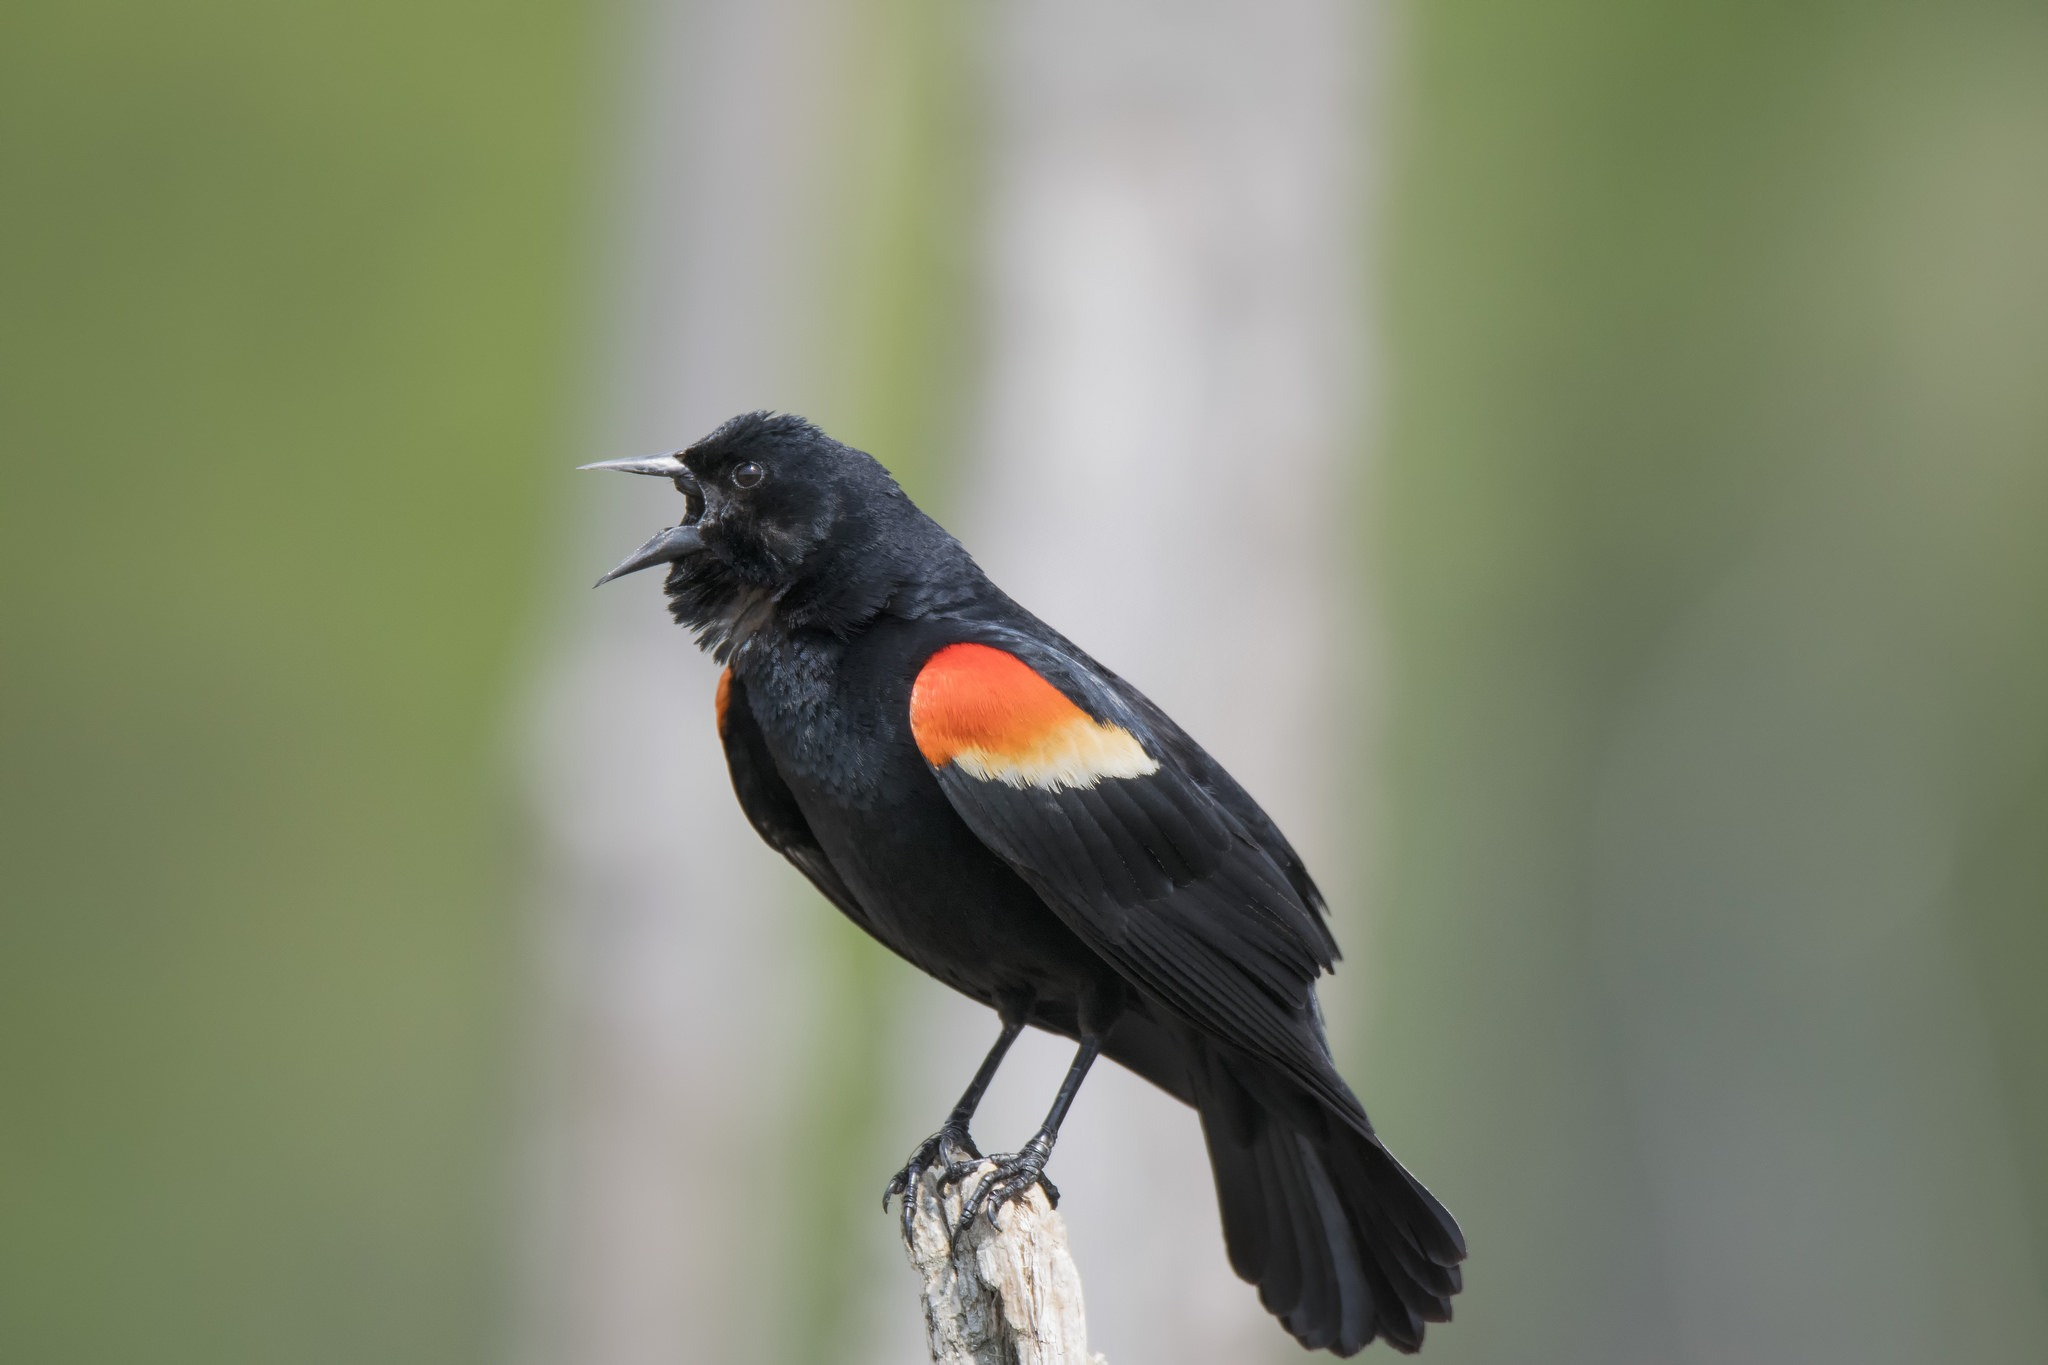 Despite COVID-19 We Are Still Busy Working For Canada's Birds!